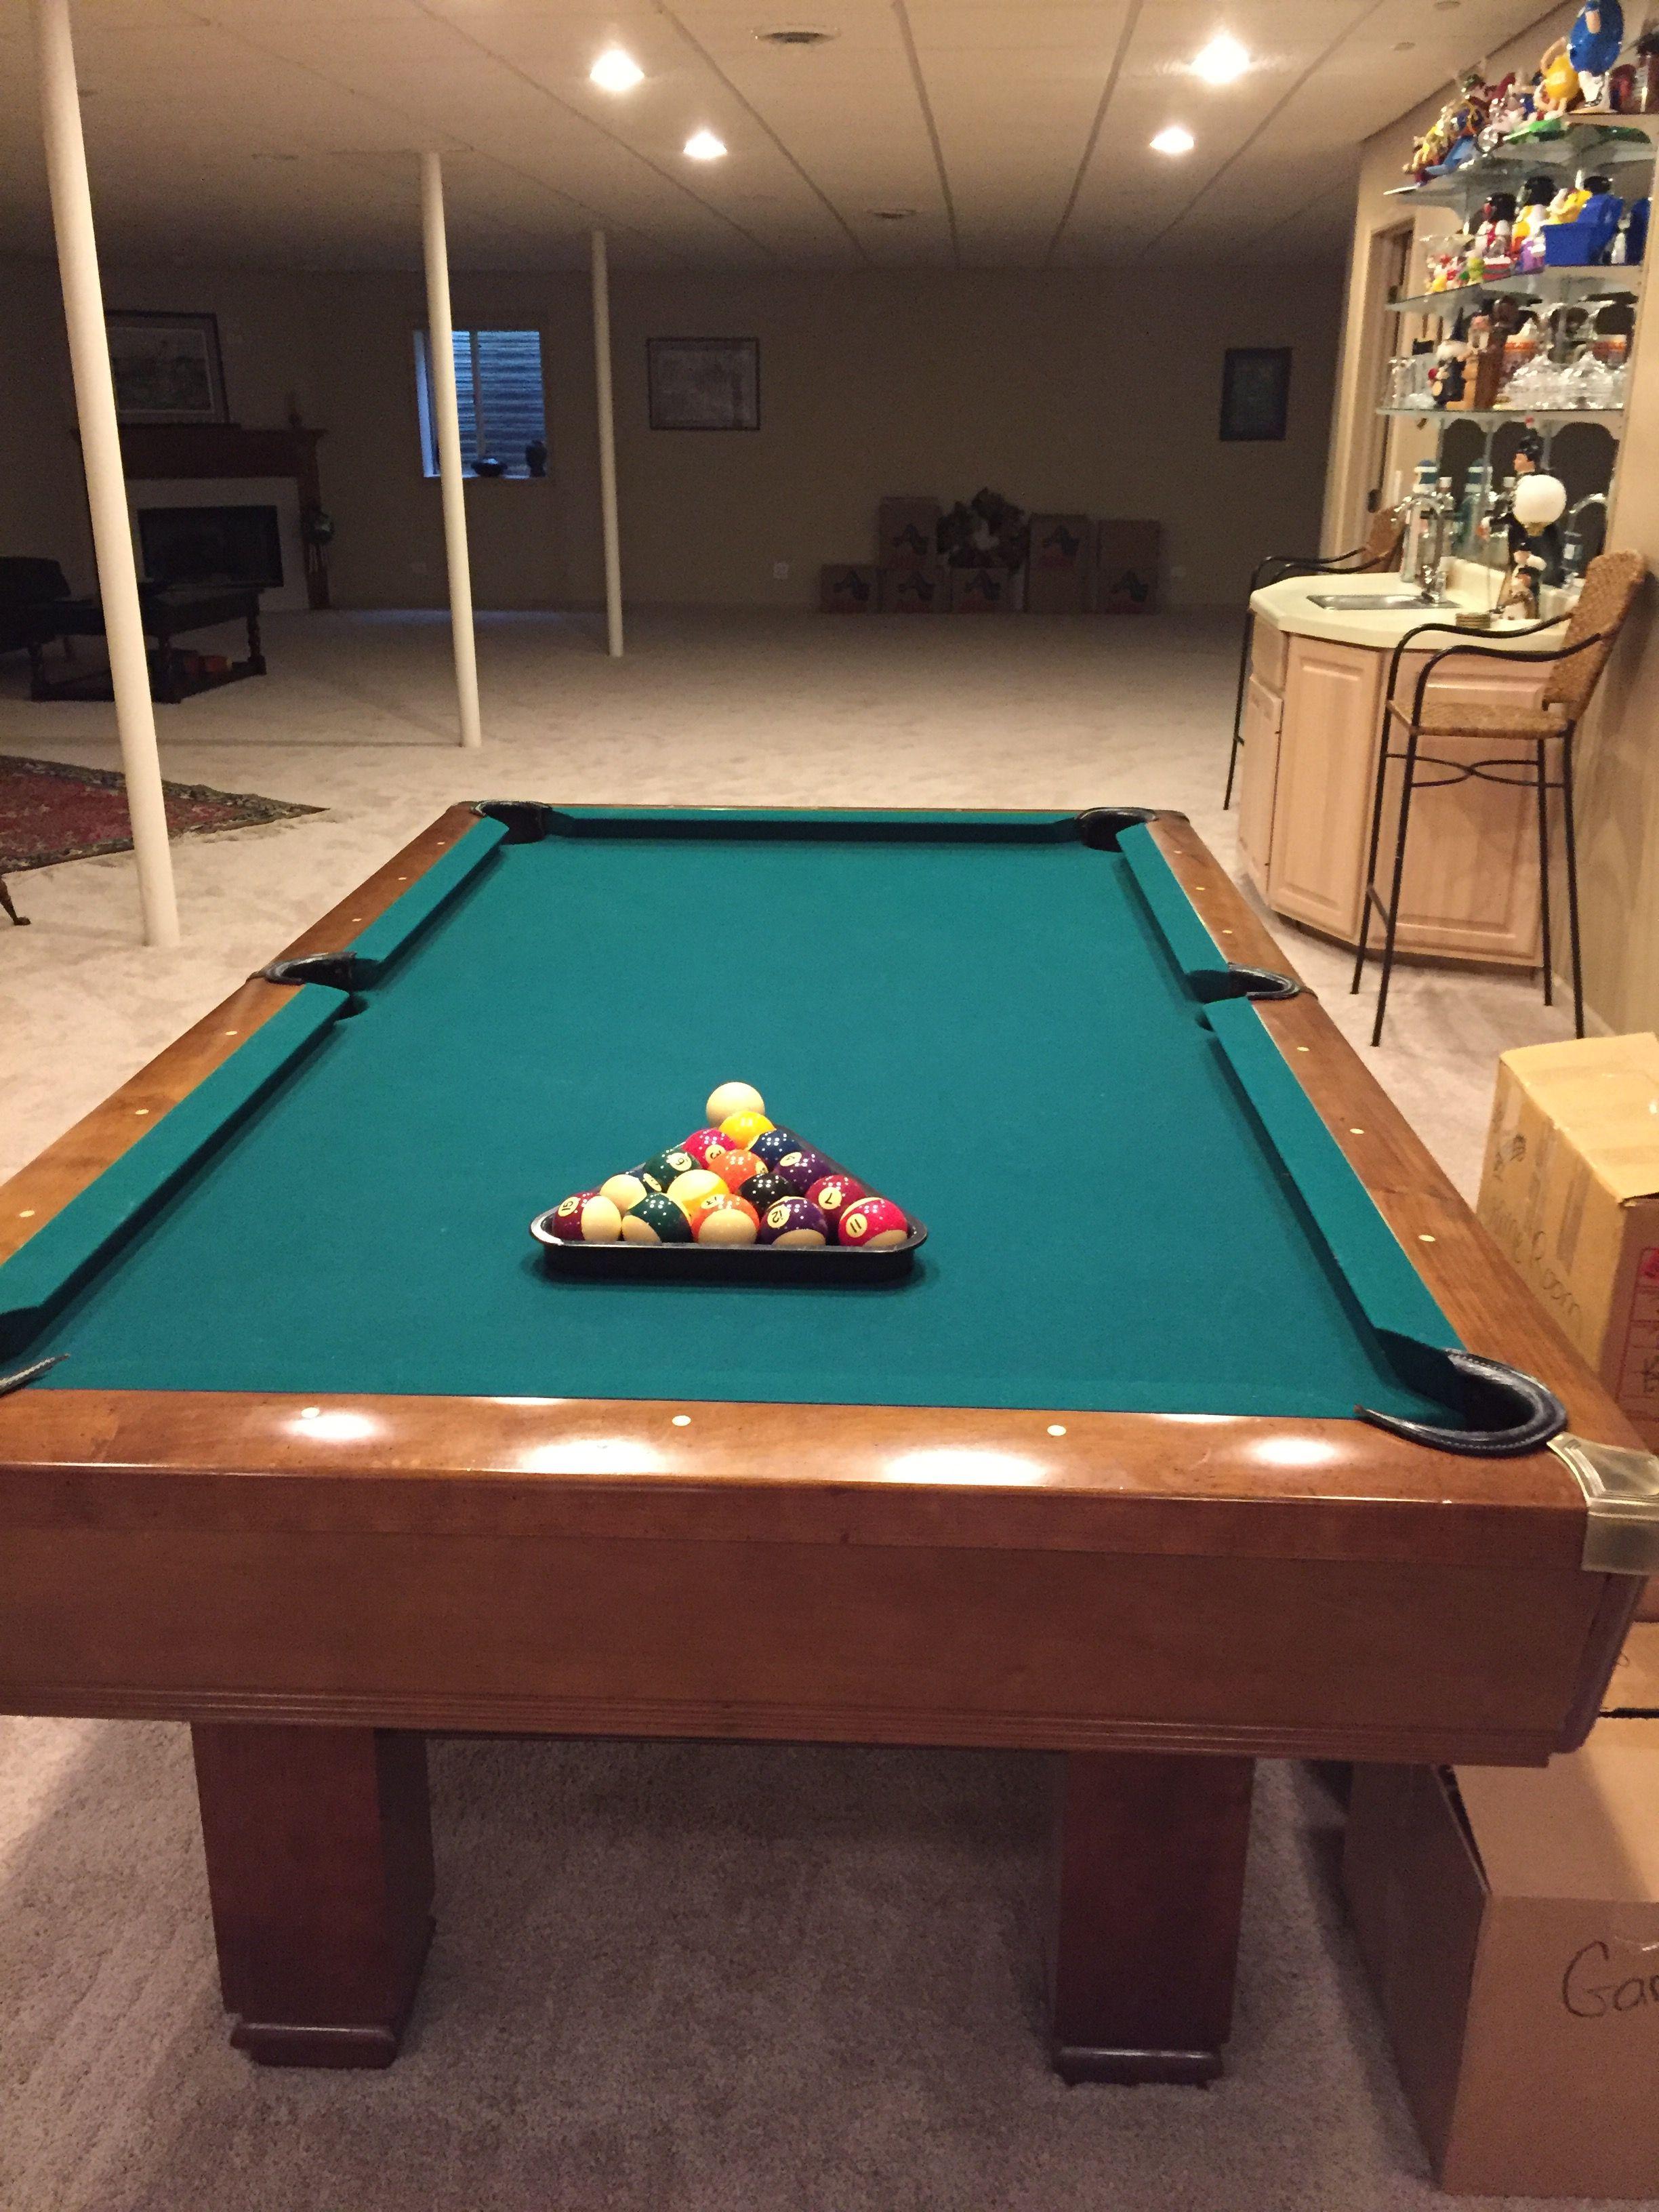 Brunswick Billiards Hawthorne Pool Table Sold in 2019